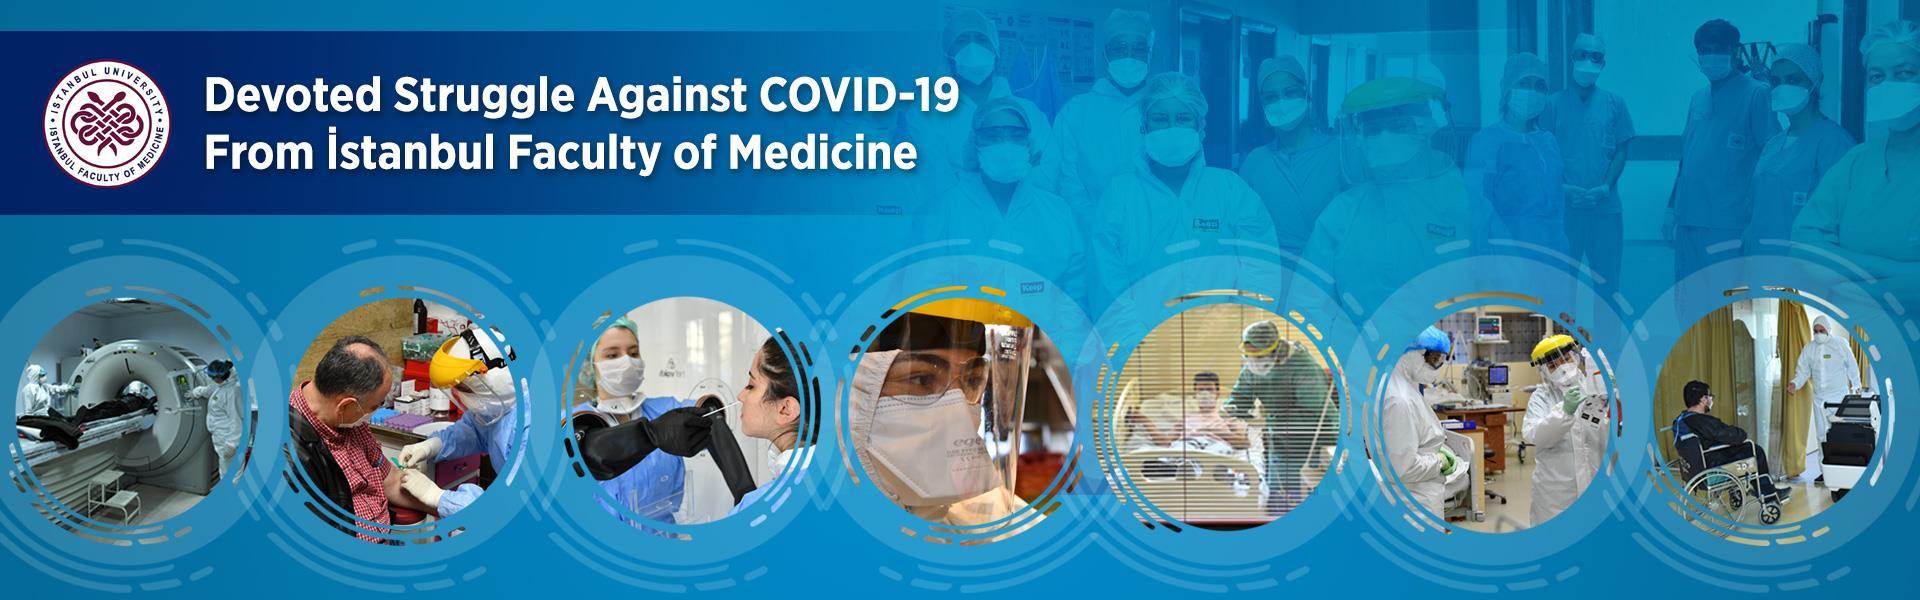 COVID-19 İstanbul-Faculty-of-Medicine Coronavirus